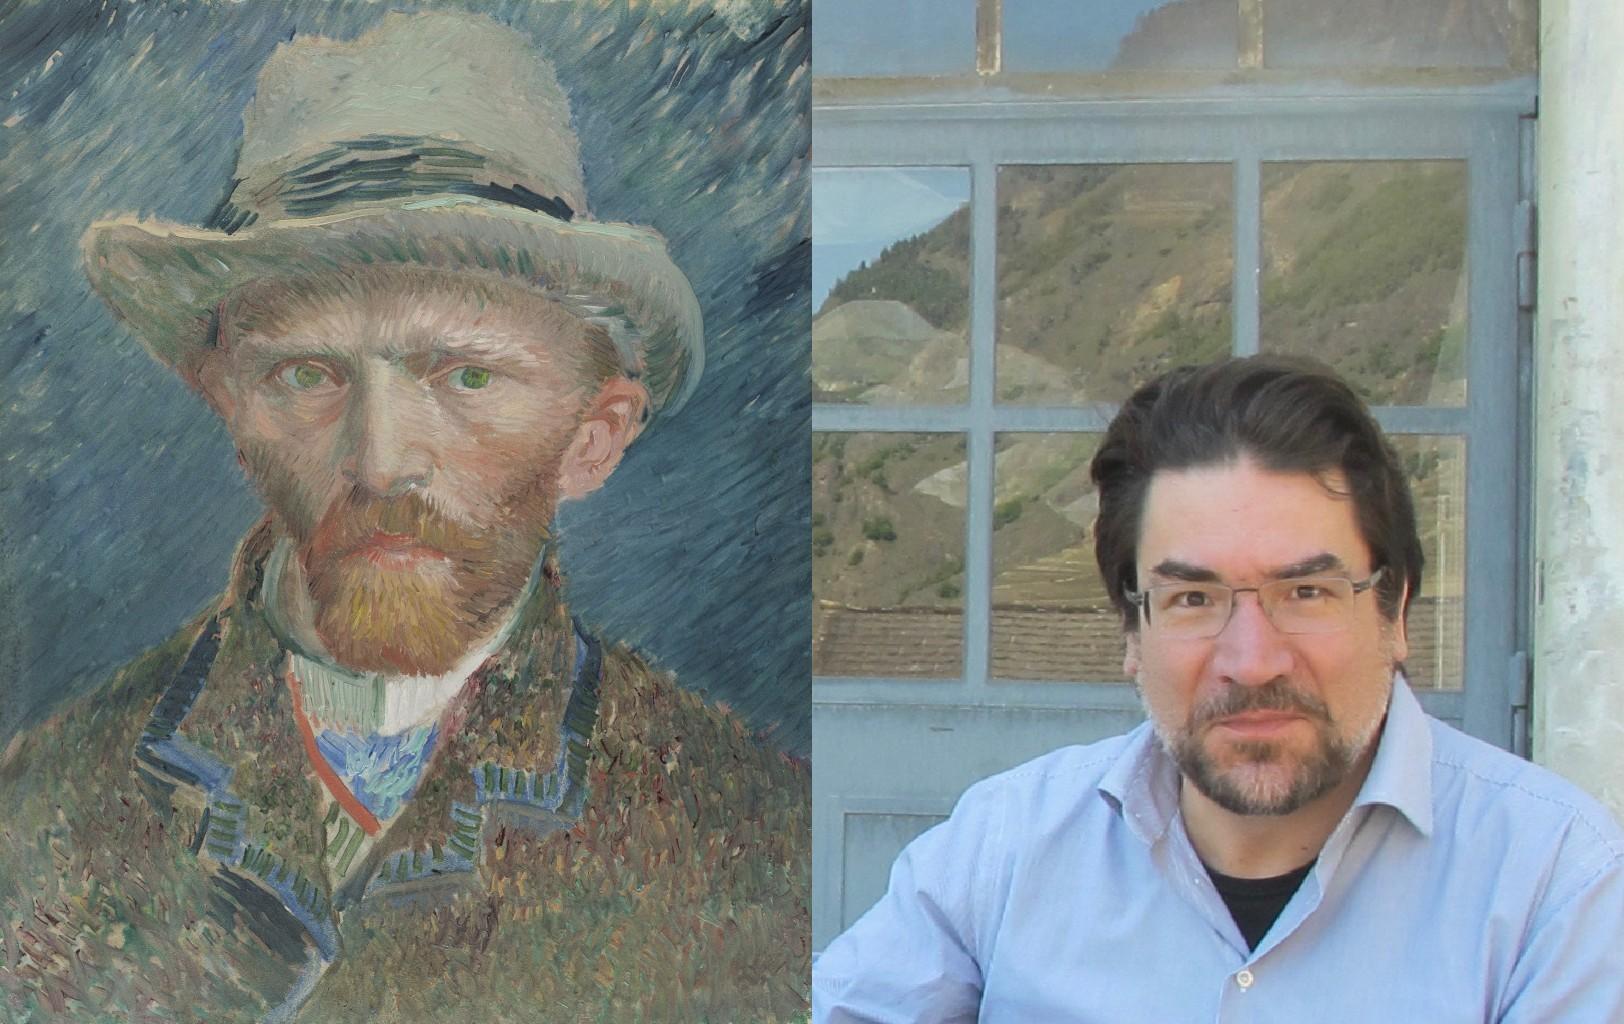 Van Gogh 1887 Self-Portrait, Vincent van Gogh (1853-1890) vanGo'd by Francois